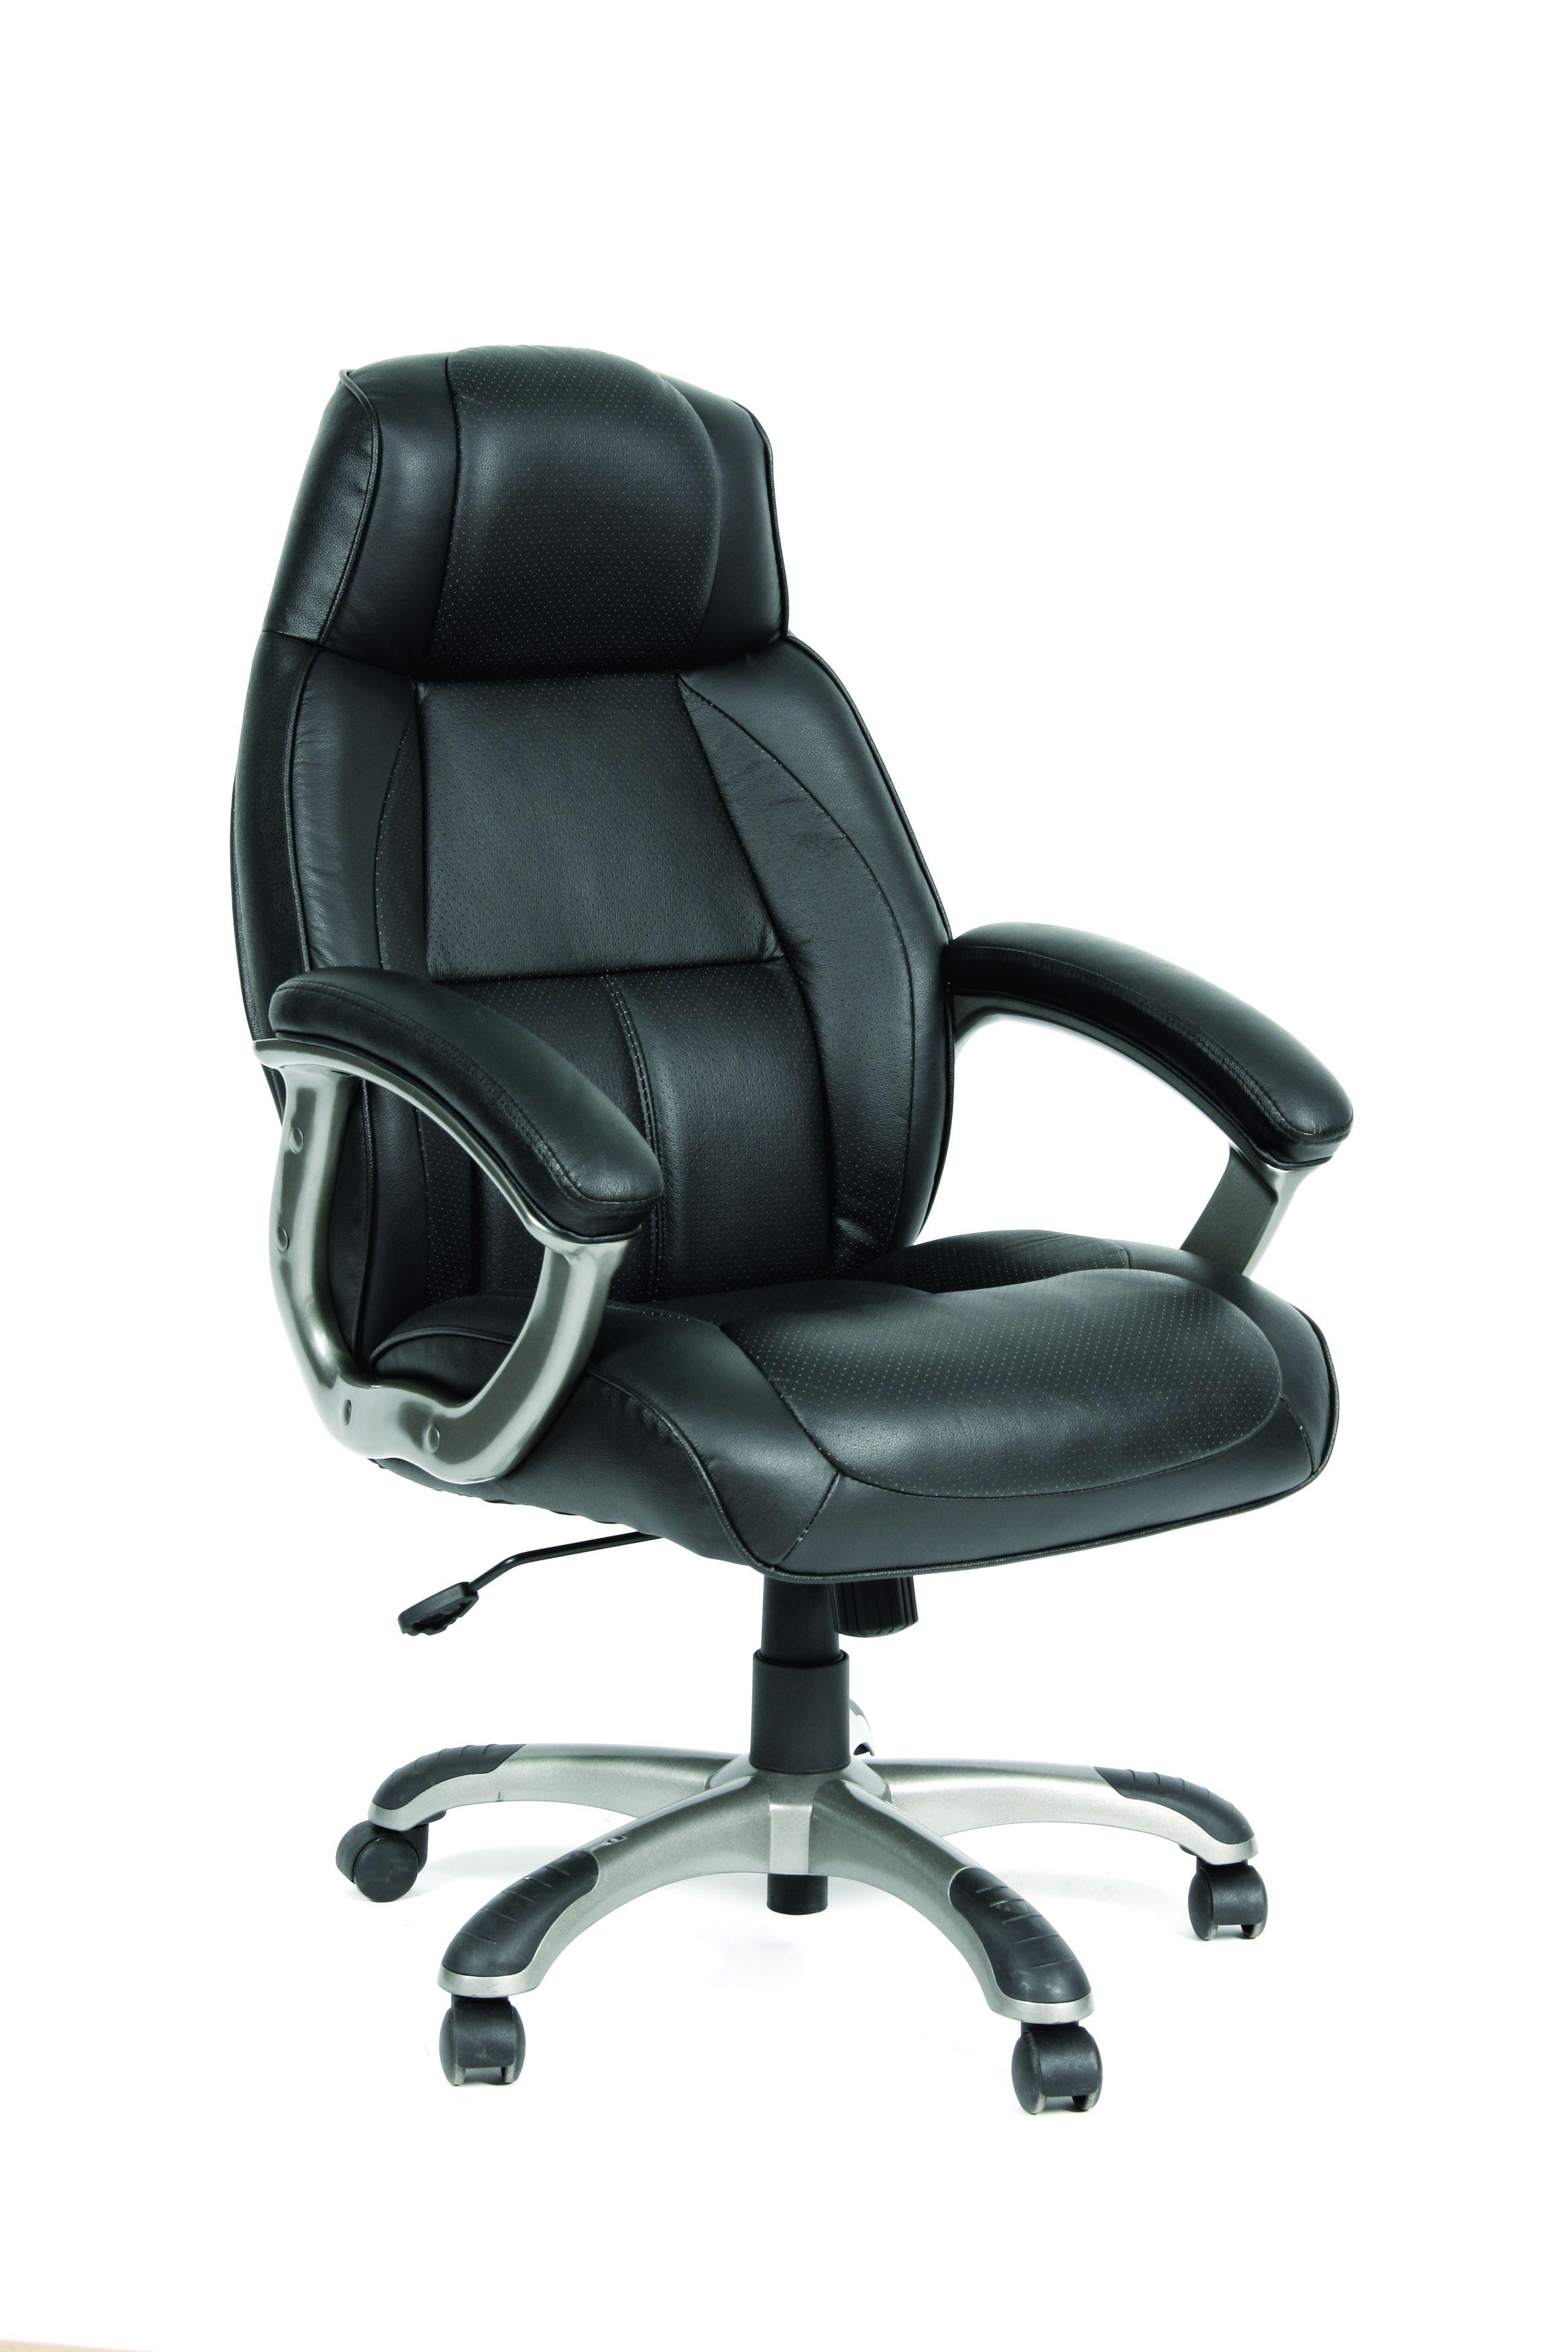 Biuro kėdė ESTES PARK 436